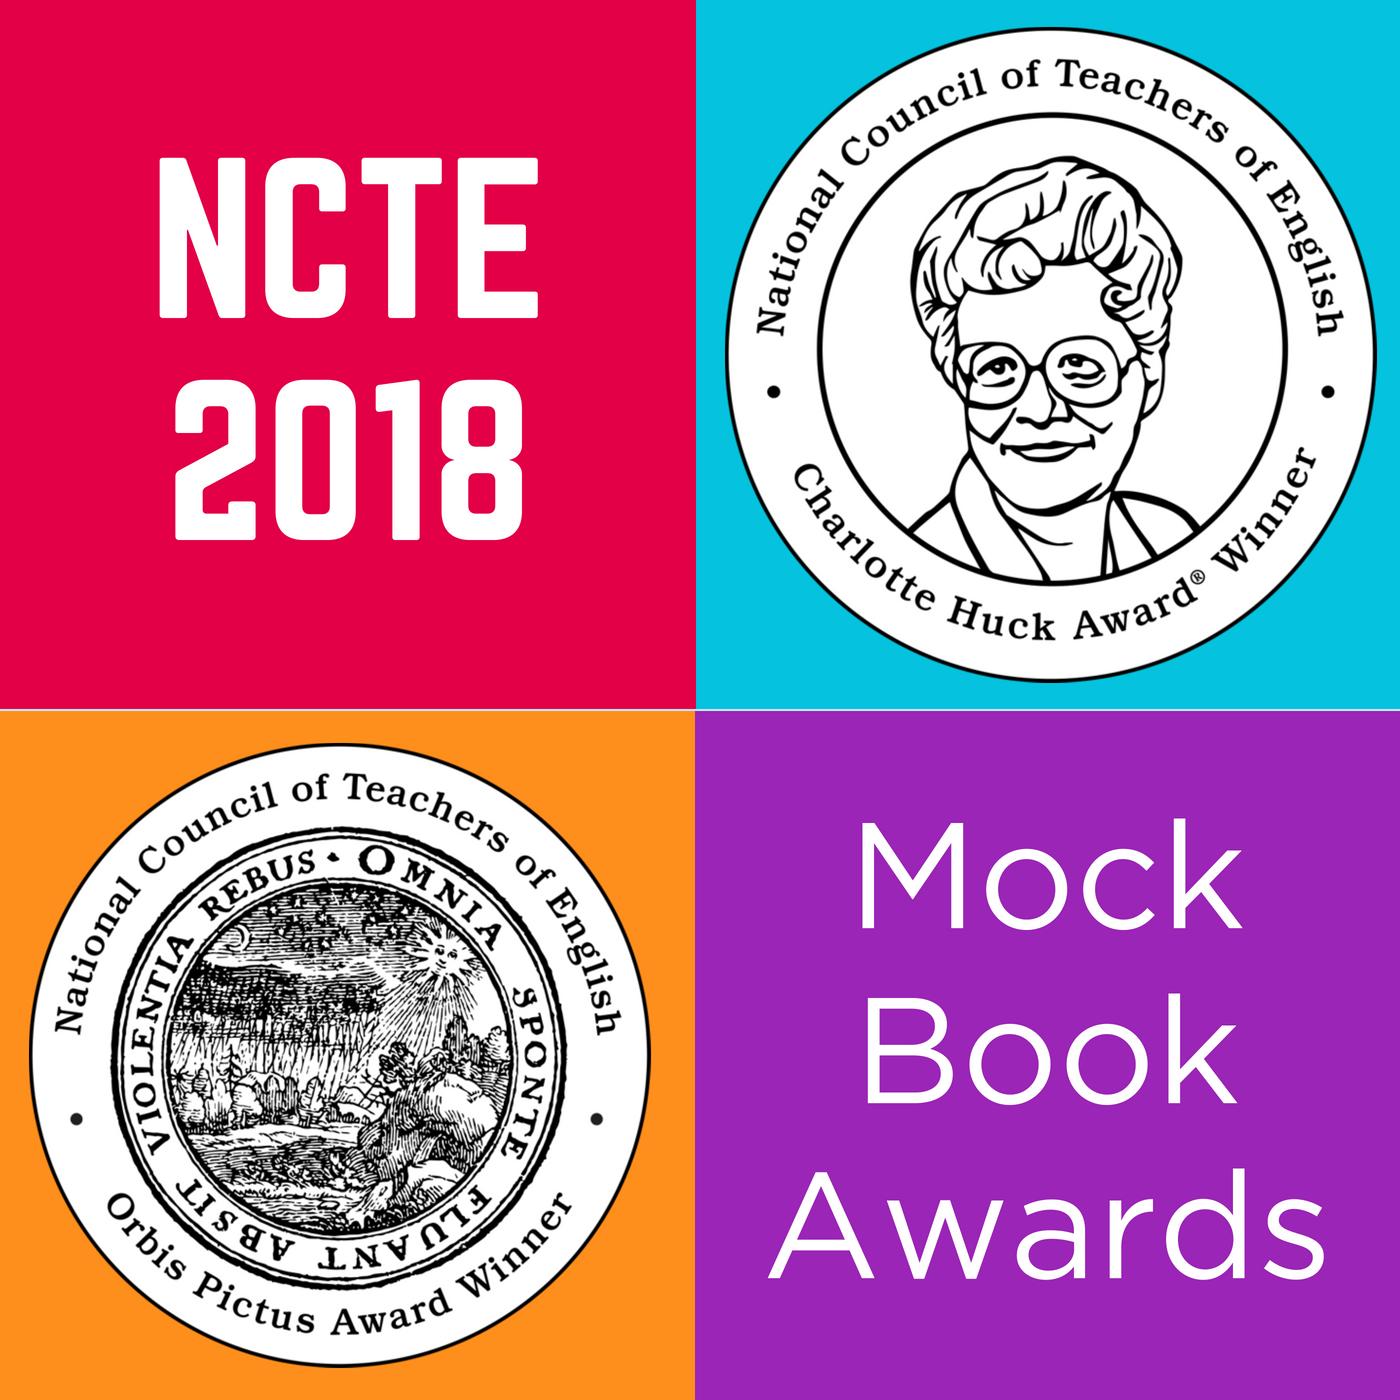 NCTE Mock Book Awards - NCTE